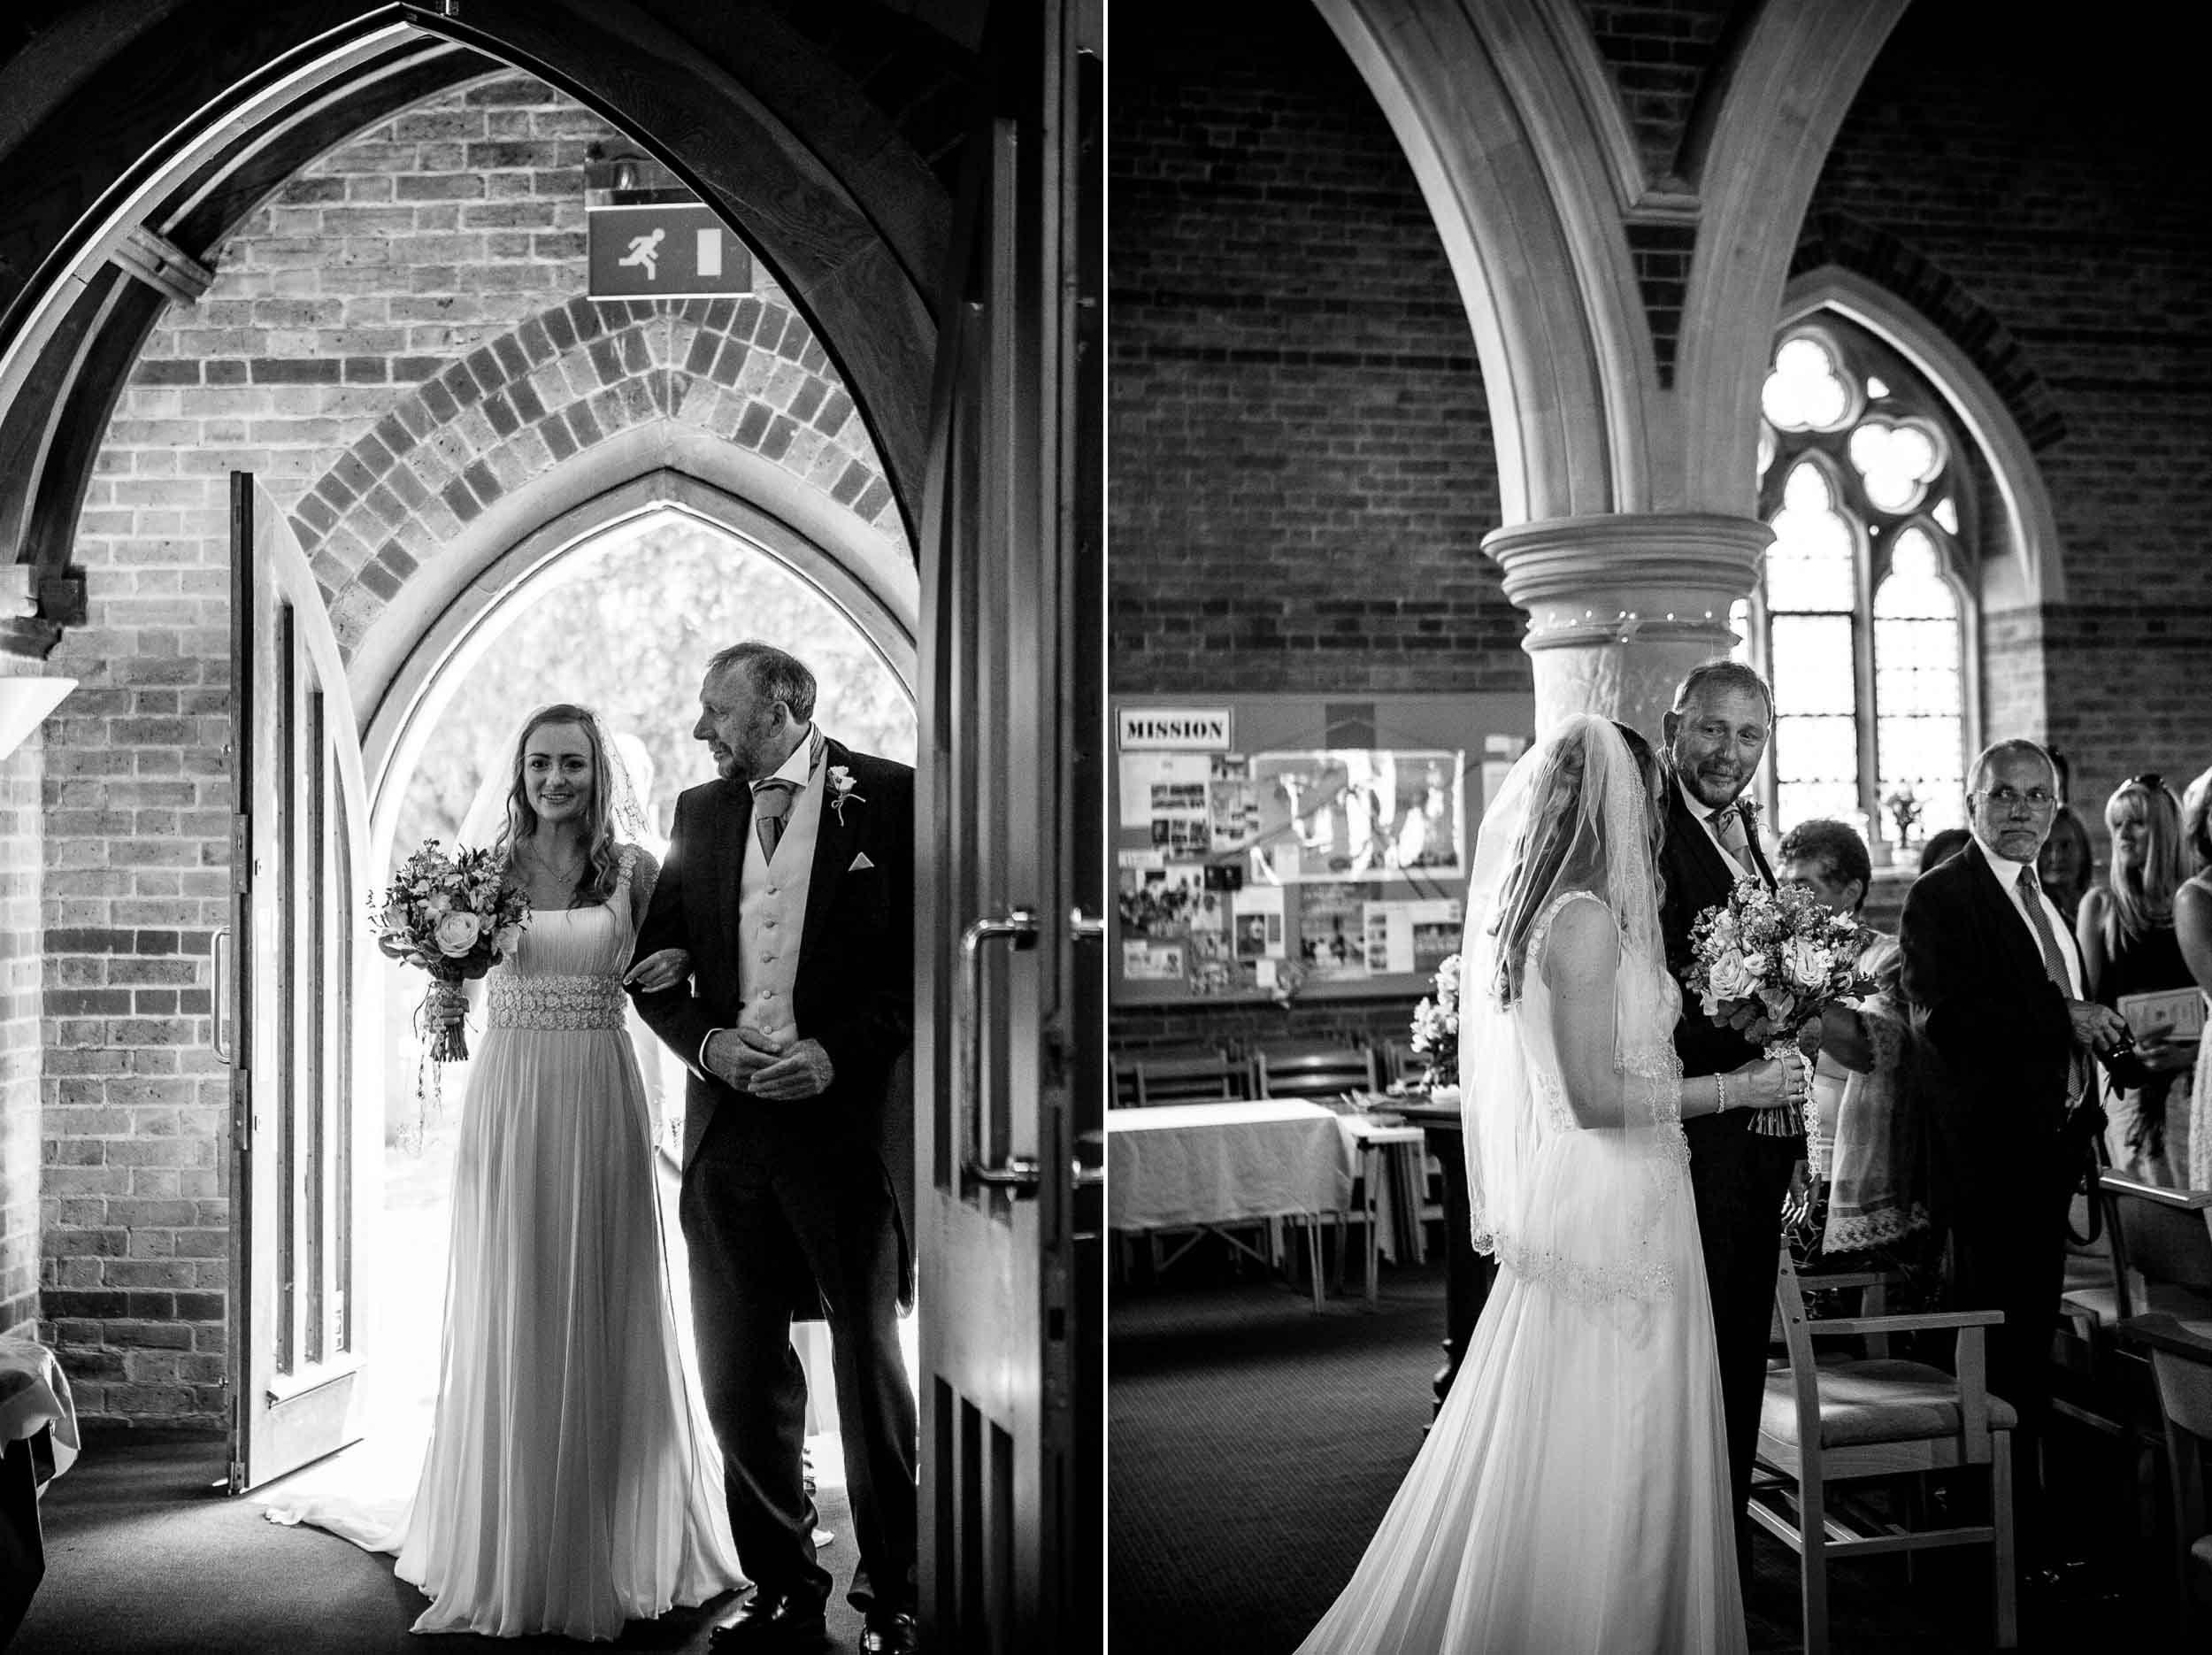 Marks-Hall-Wedding-Photographer-27.jpg